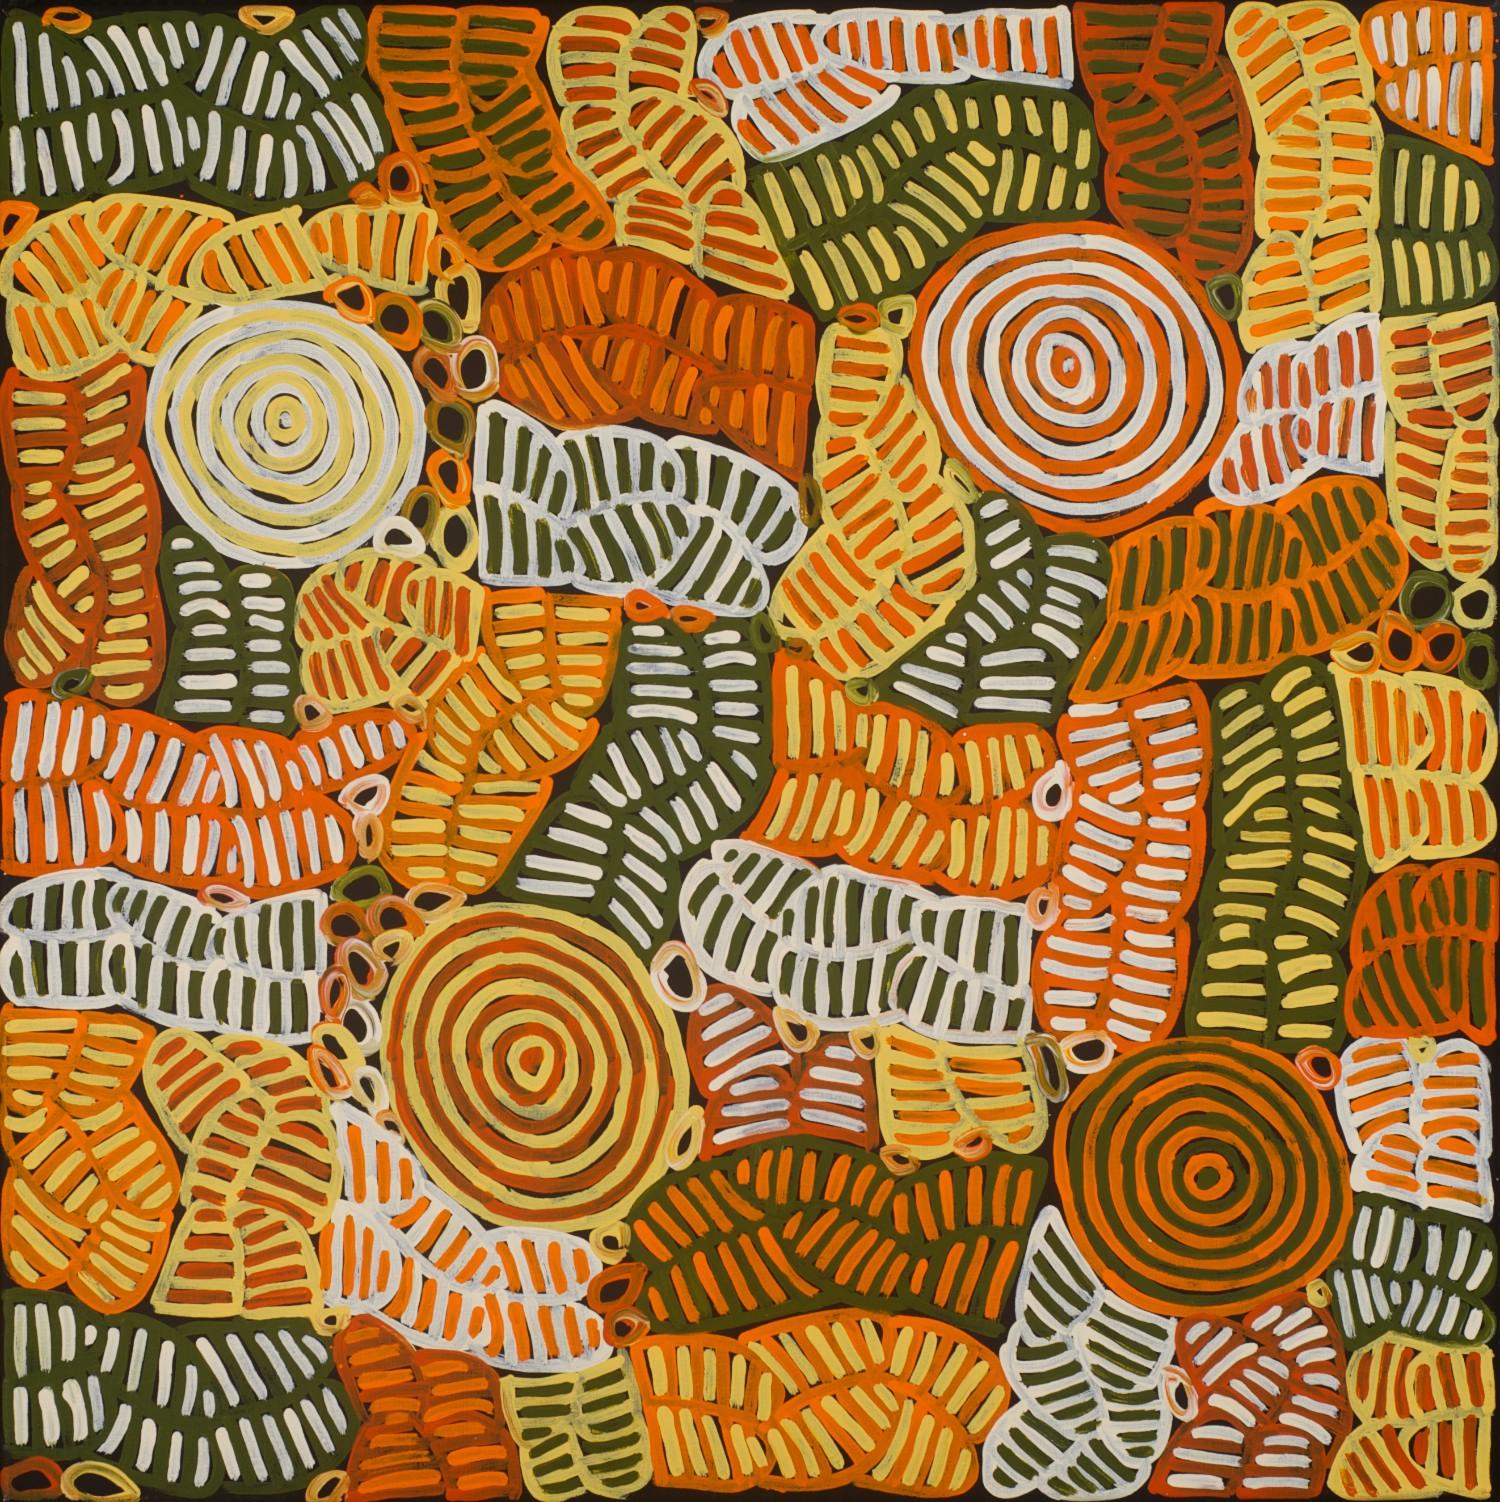 Betty Mbitjana 'Bush Melon and Awelye' 90cm x 90cm #12714